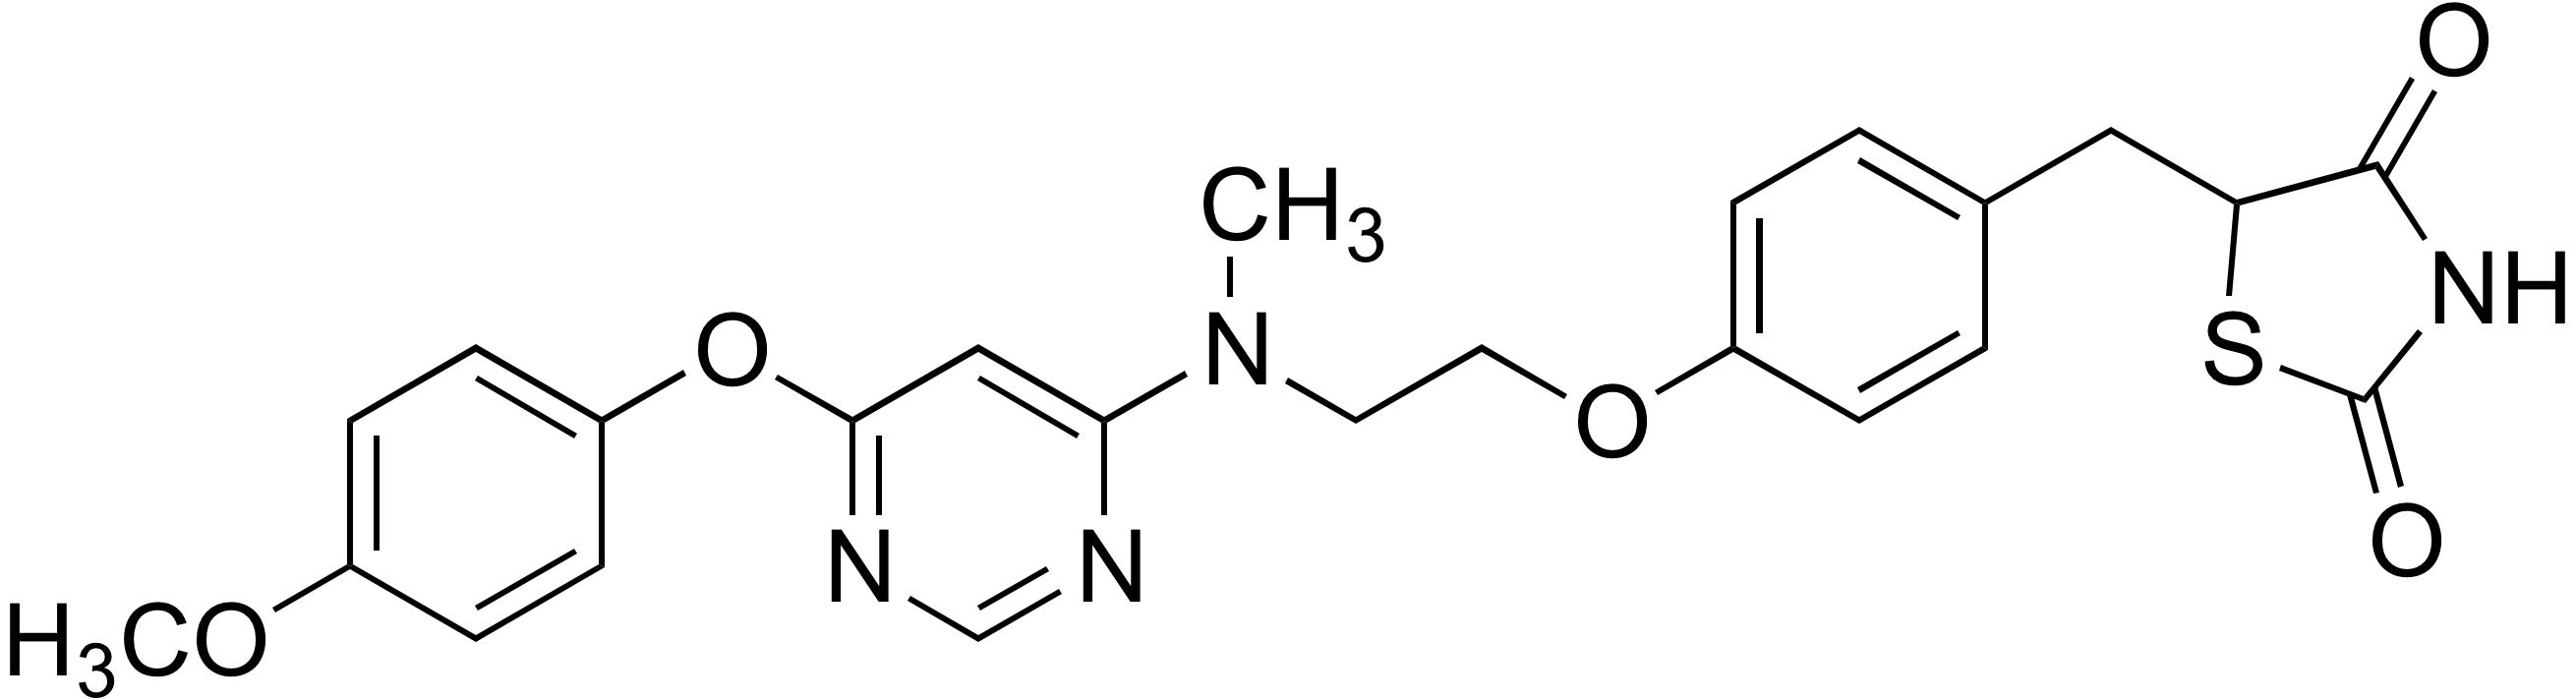 Lobeglitazone